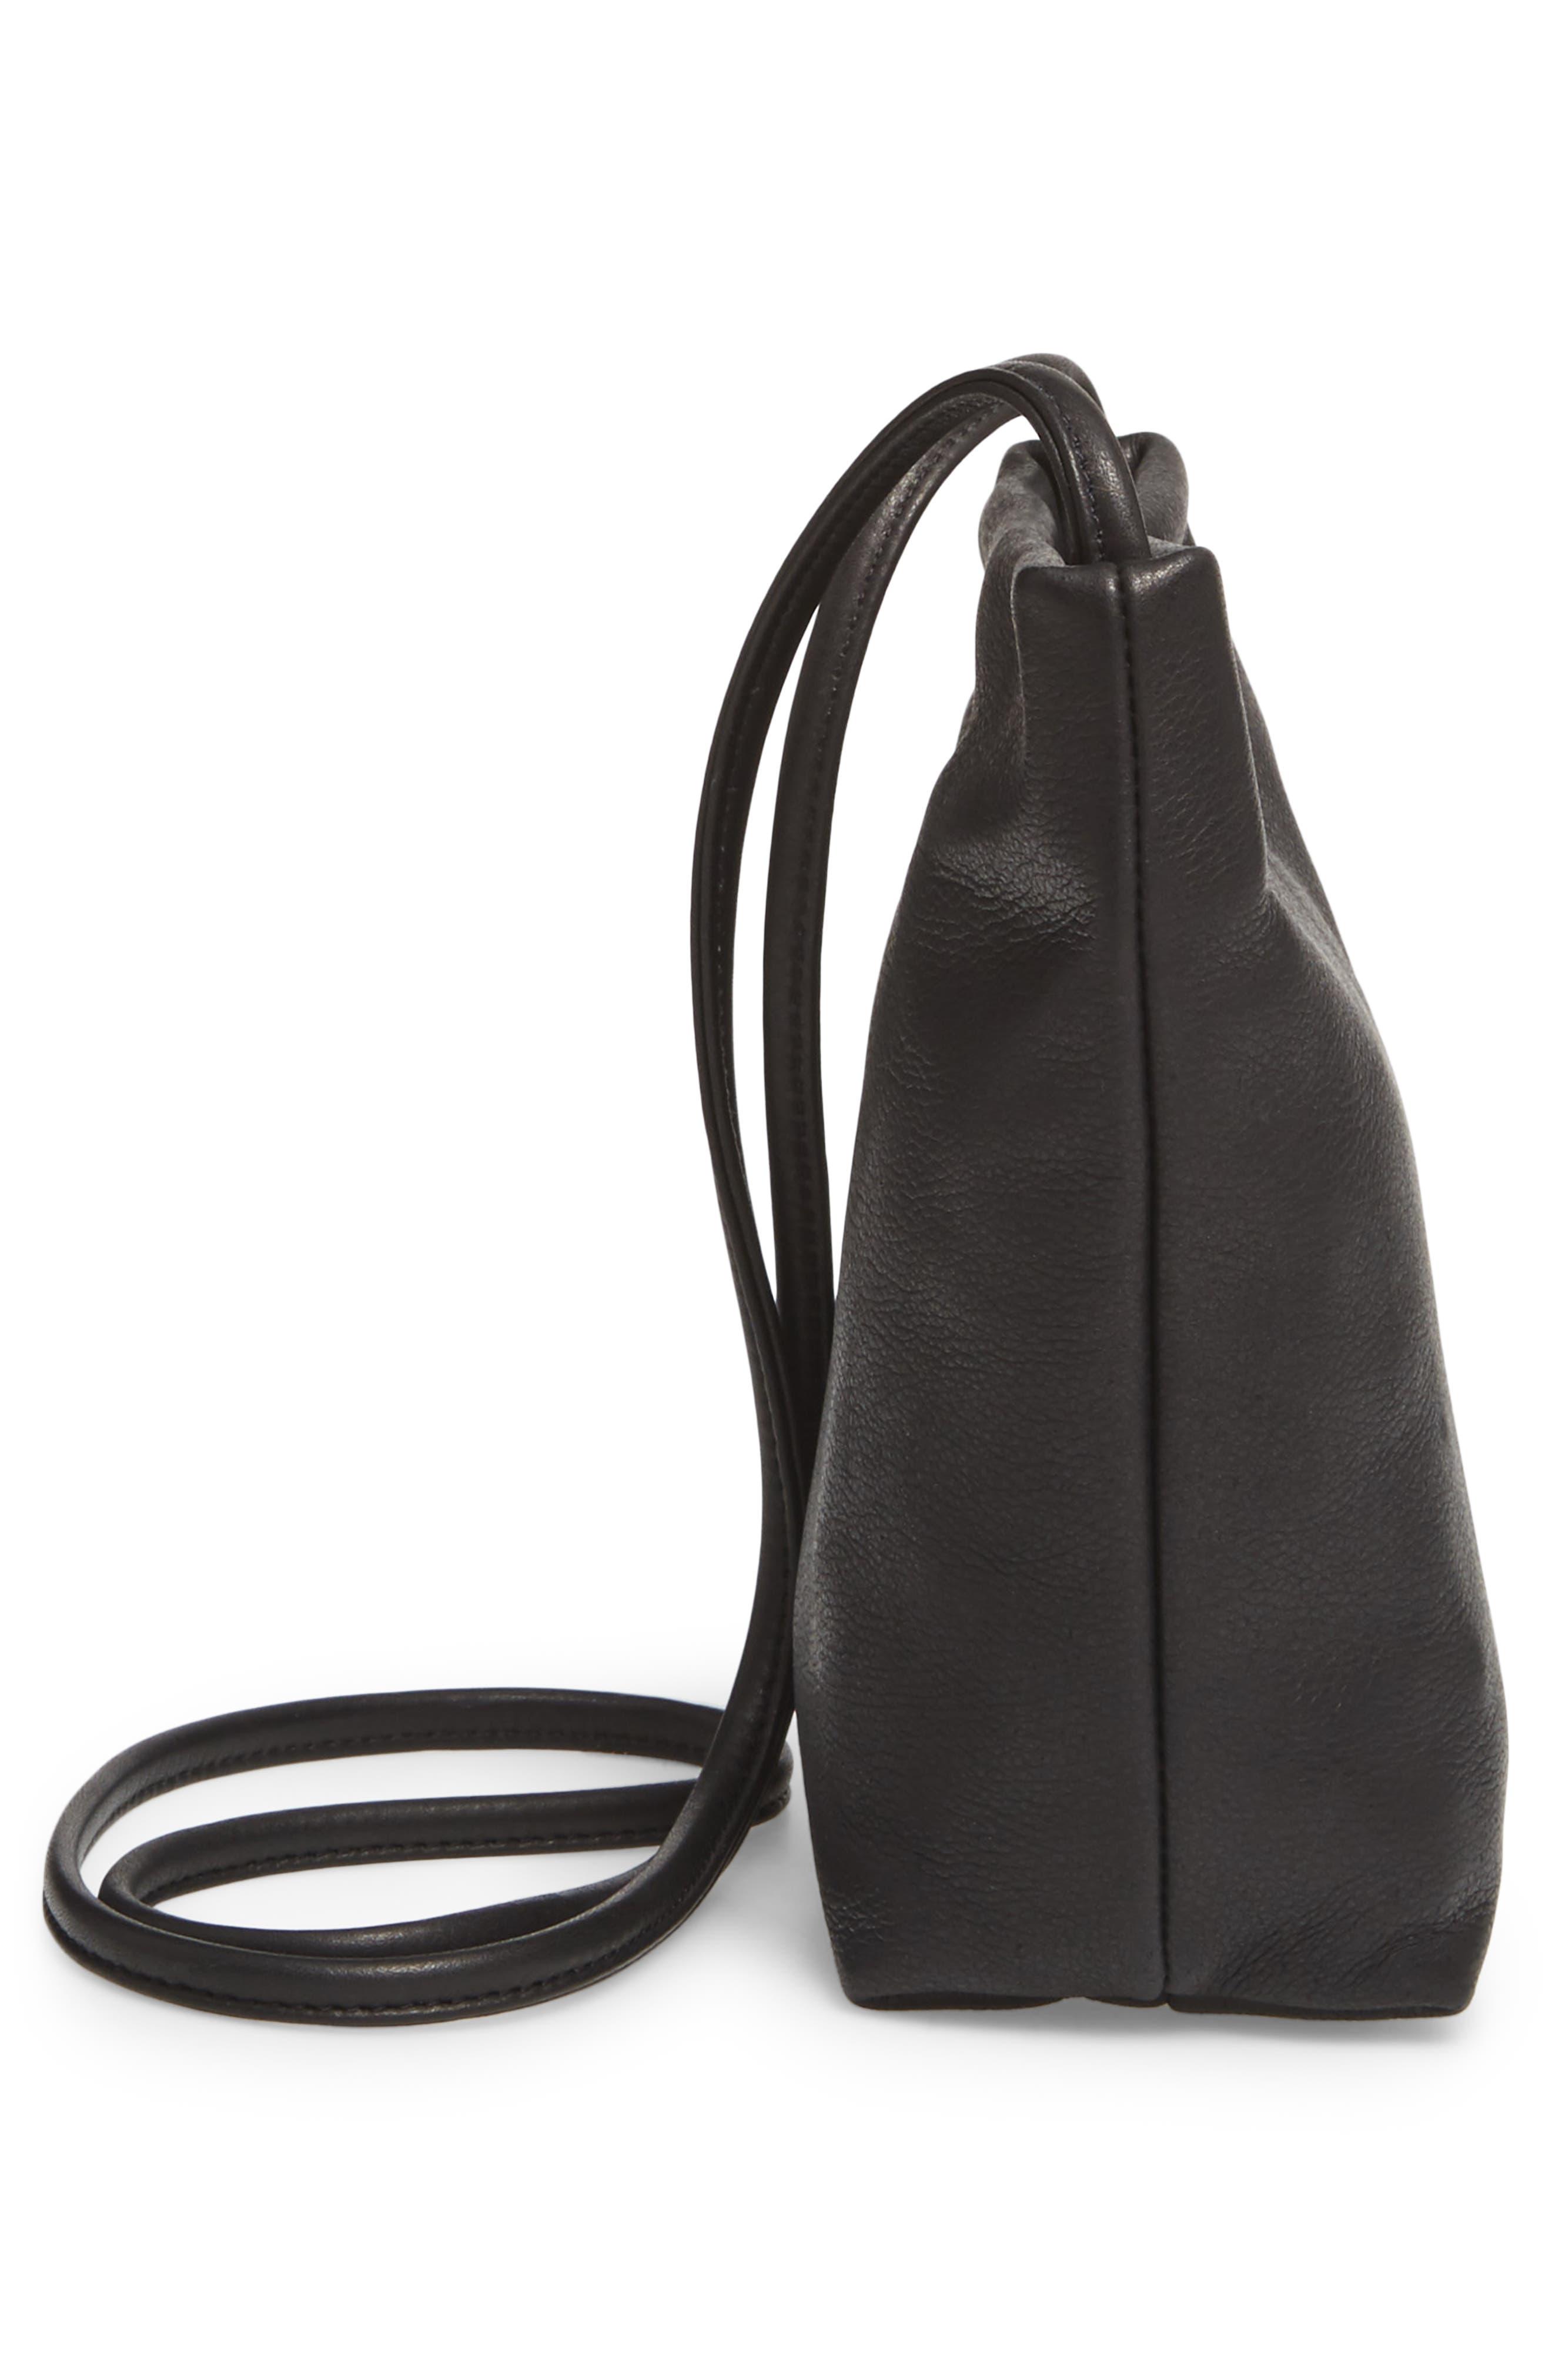 Leather Crossbody Bag,                             Alternate thumbnail 4, color,                             Black